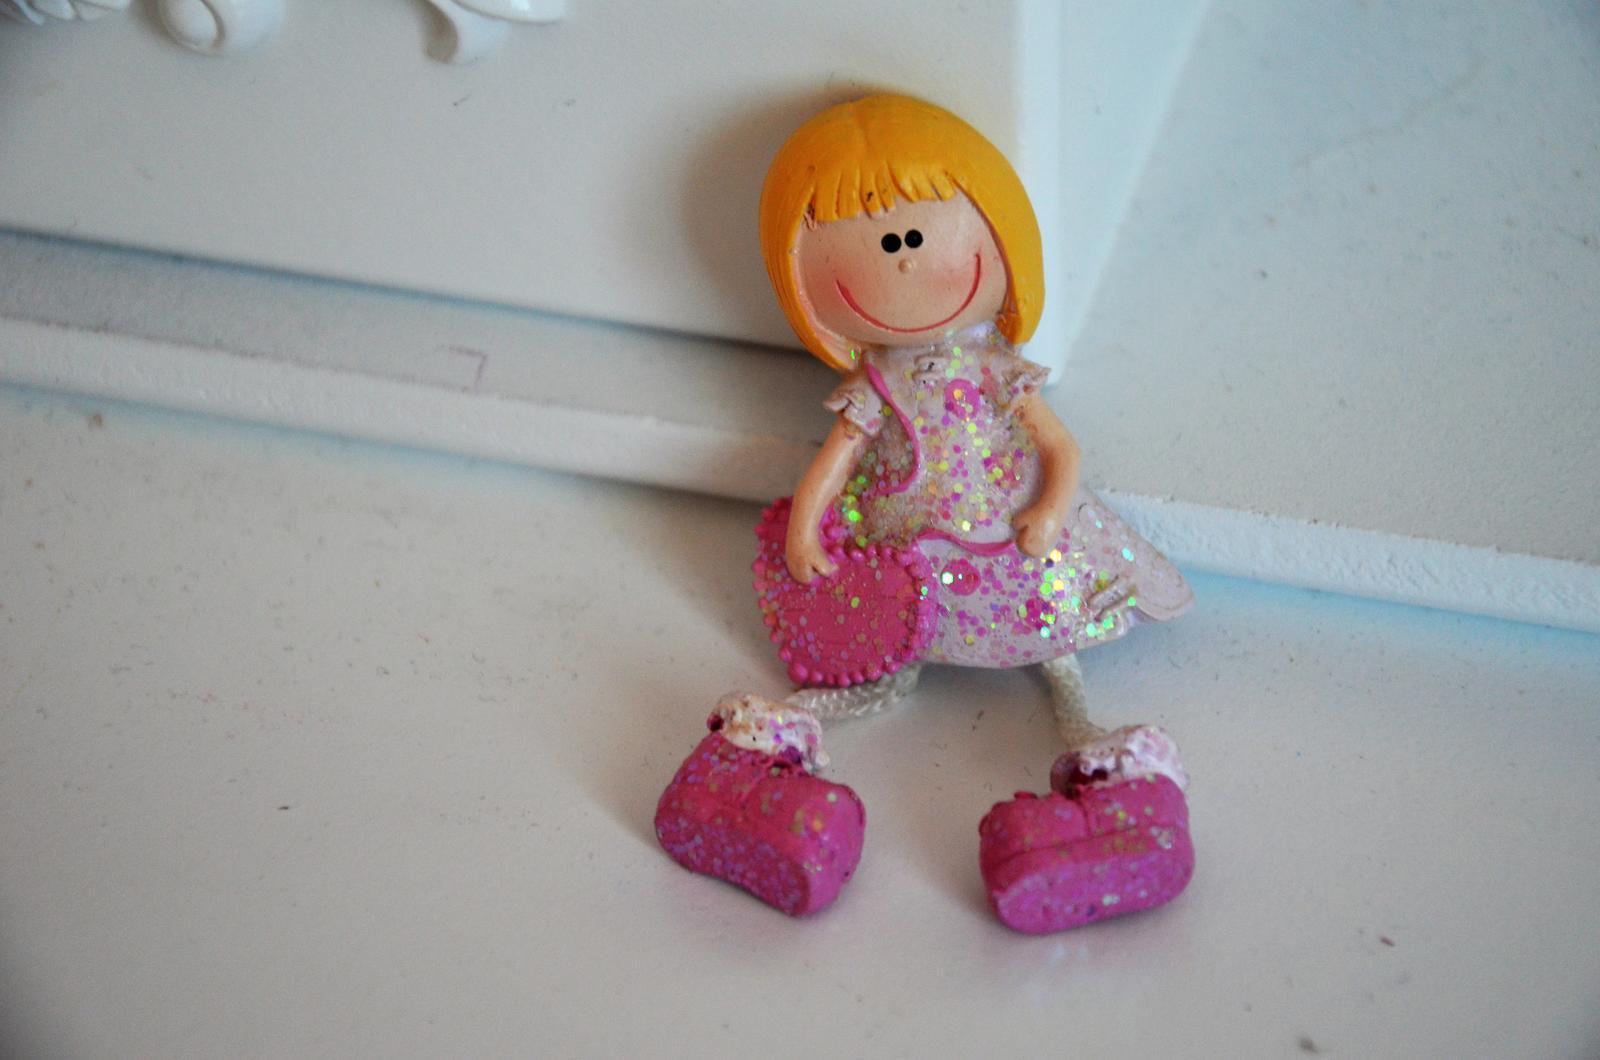 magnetka dievčatko-2 - Obrázok č. 1